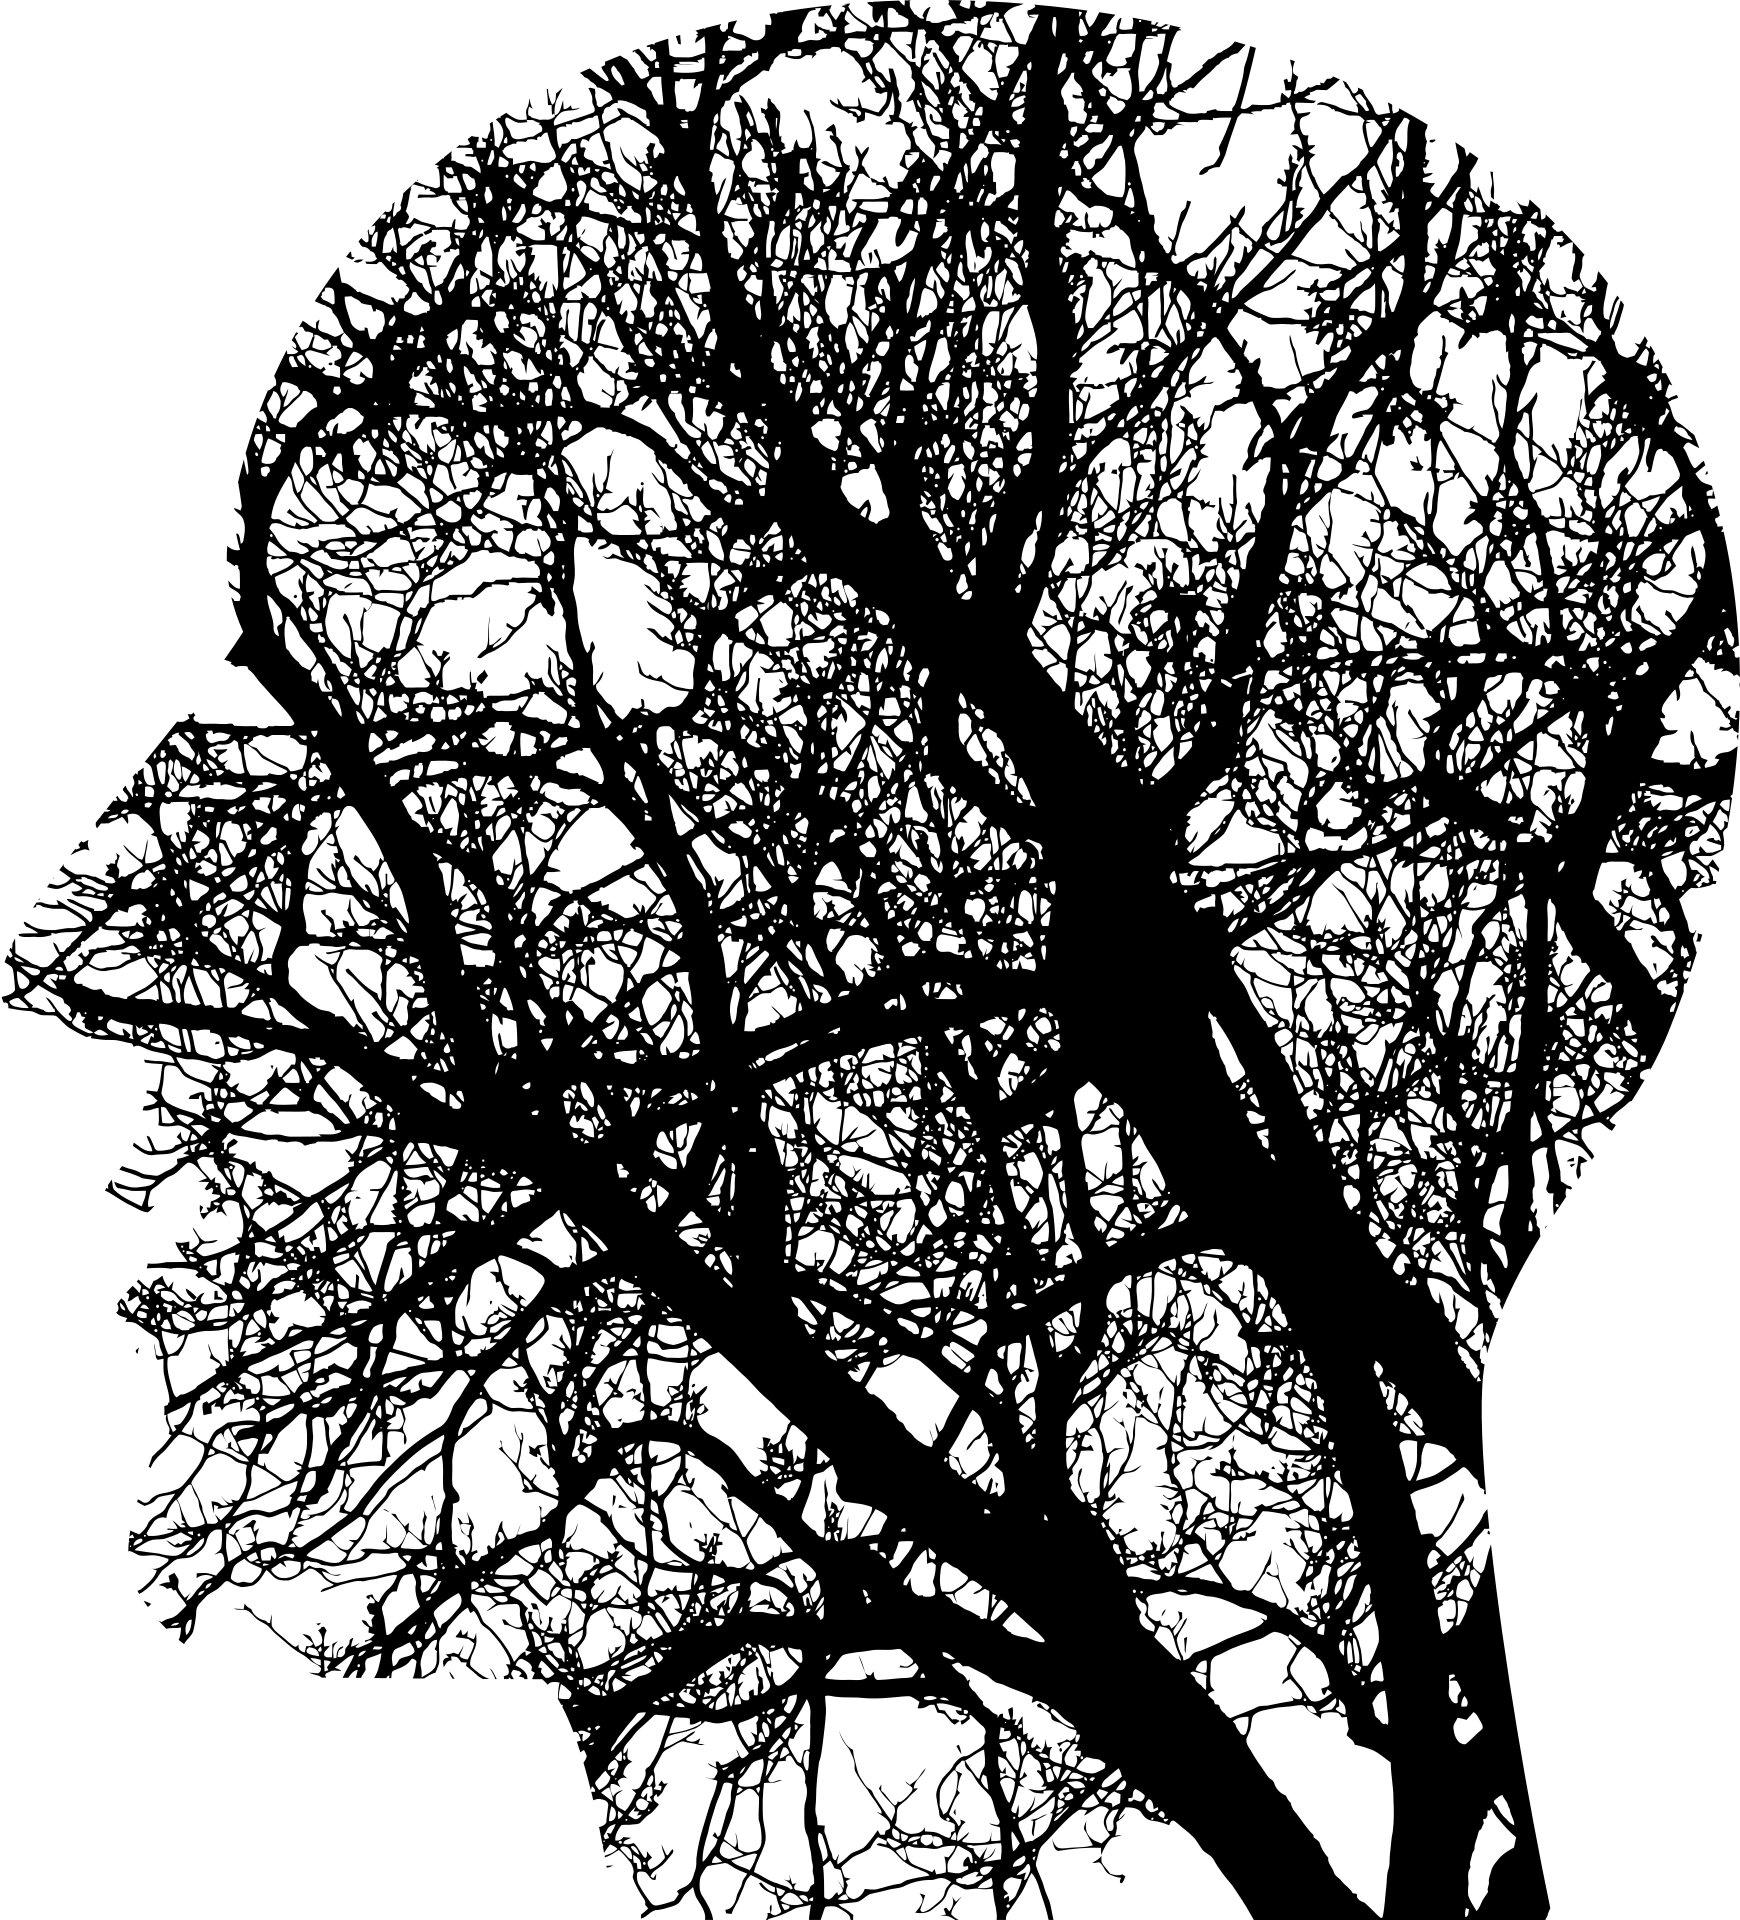 Sensory perception is not superficial brain work